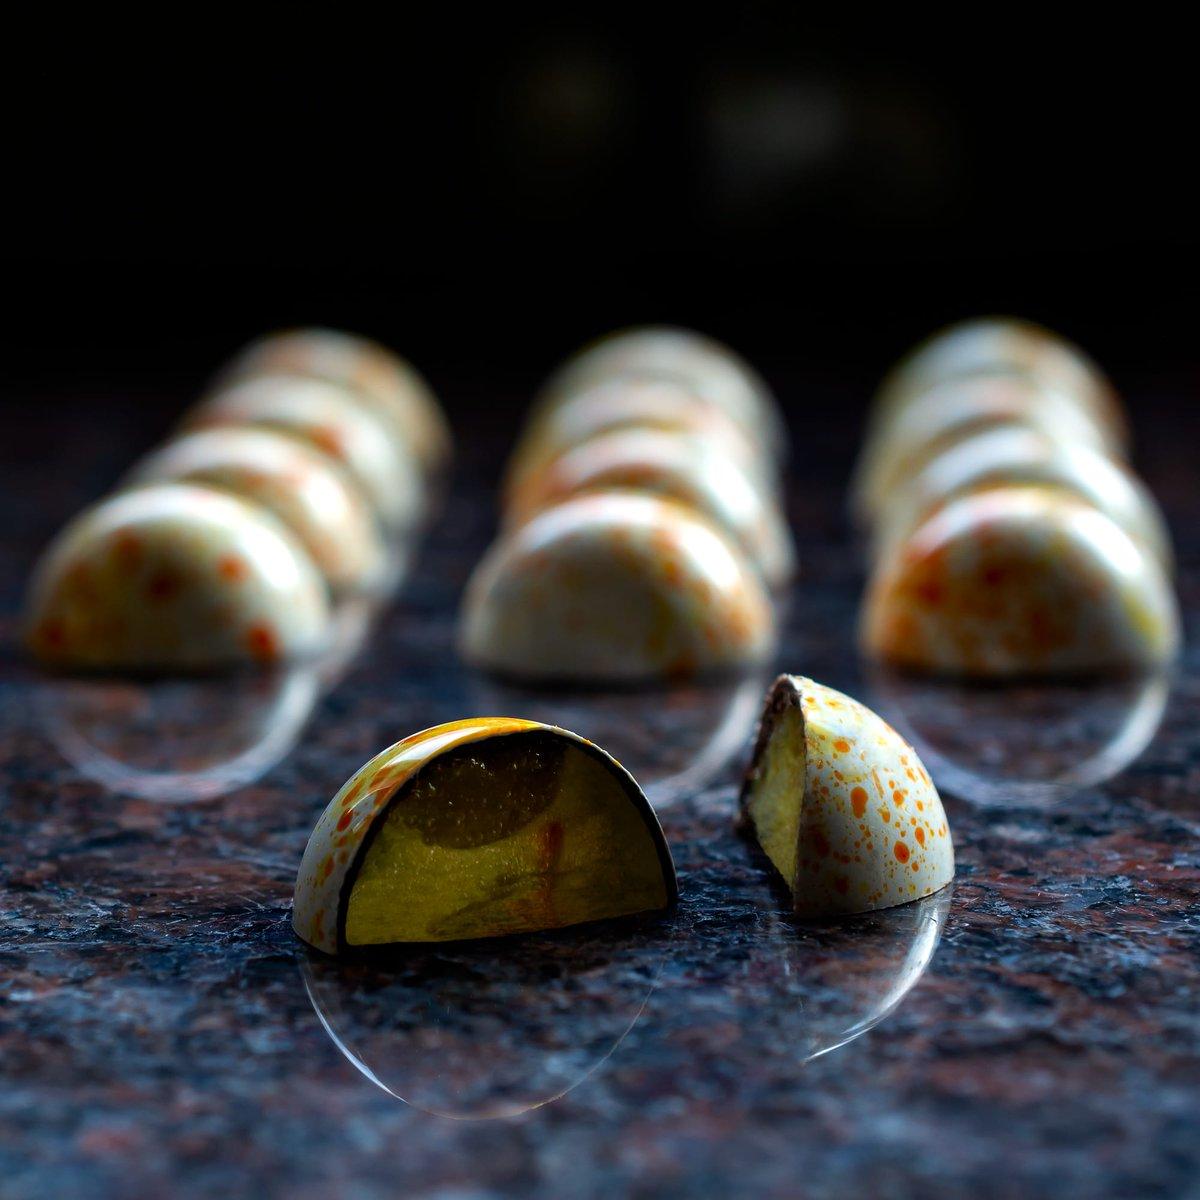 Inside the Saffron, Ivoire & Lemon   #valrhonauk #bonbons #citrus #saffron #ivoire #lemon #pastrychef #inside #stayhomepic.twitter.com/jTKI8Zg7ZZ